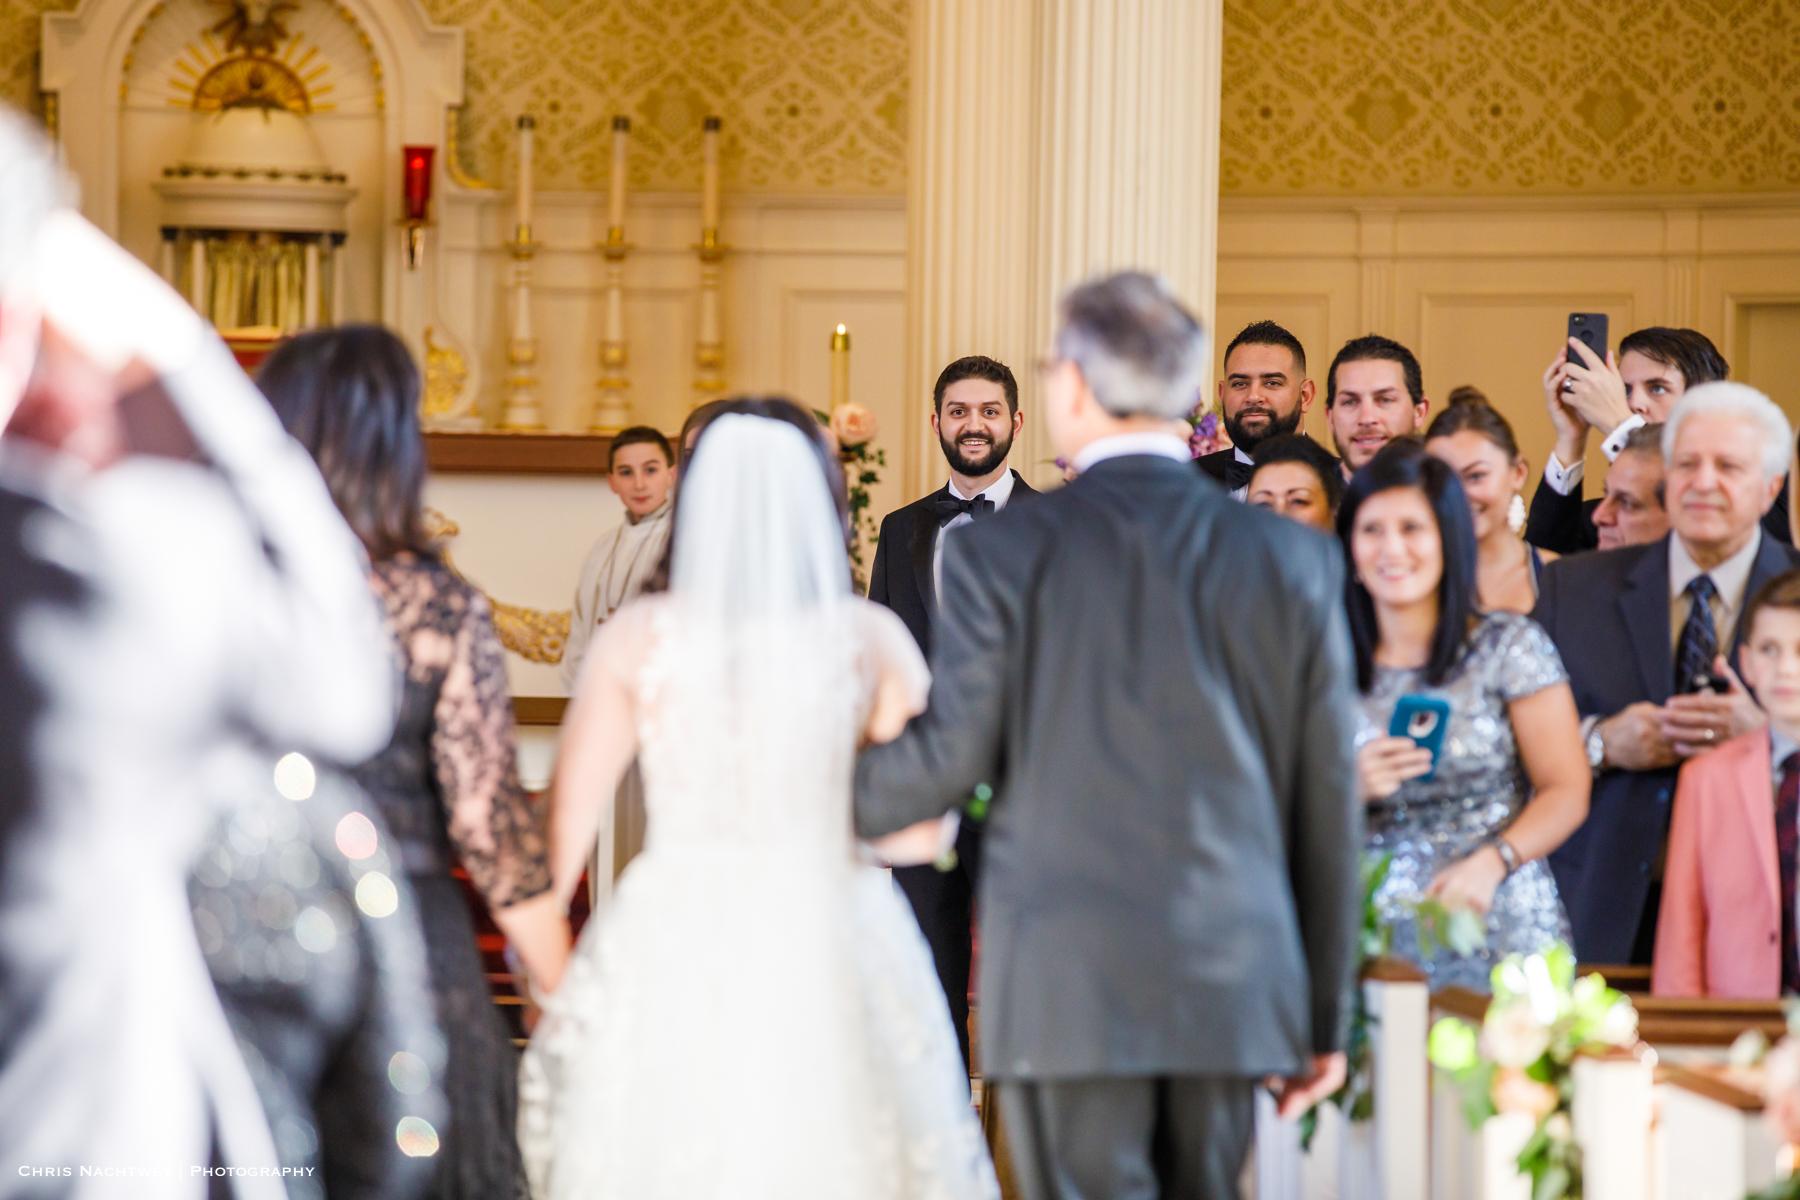 winter-branford-house-wedding-photos-groton-ct-chris-nachtwey-photography-2019-11.jpg